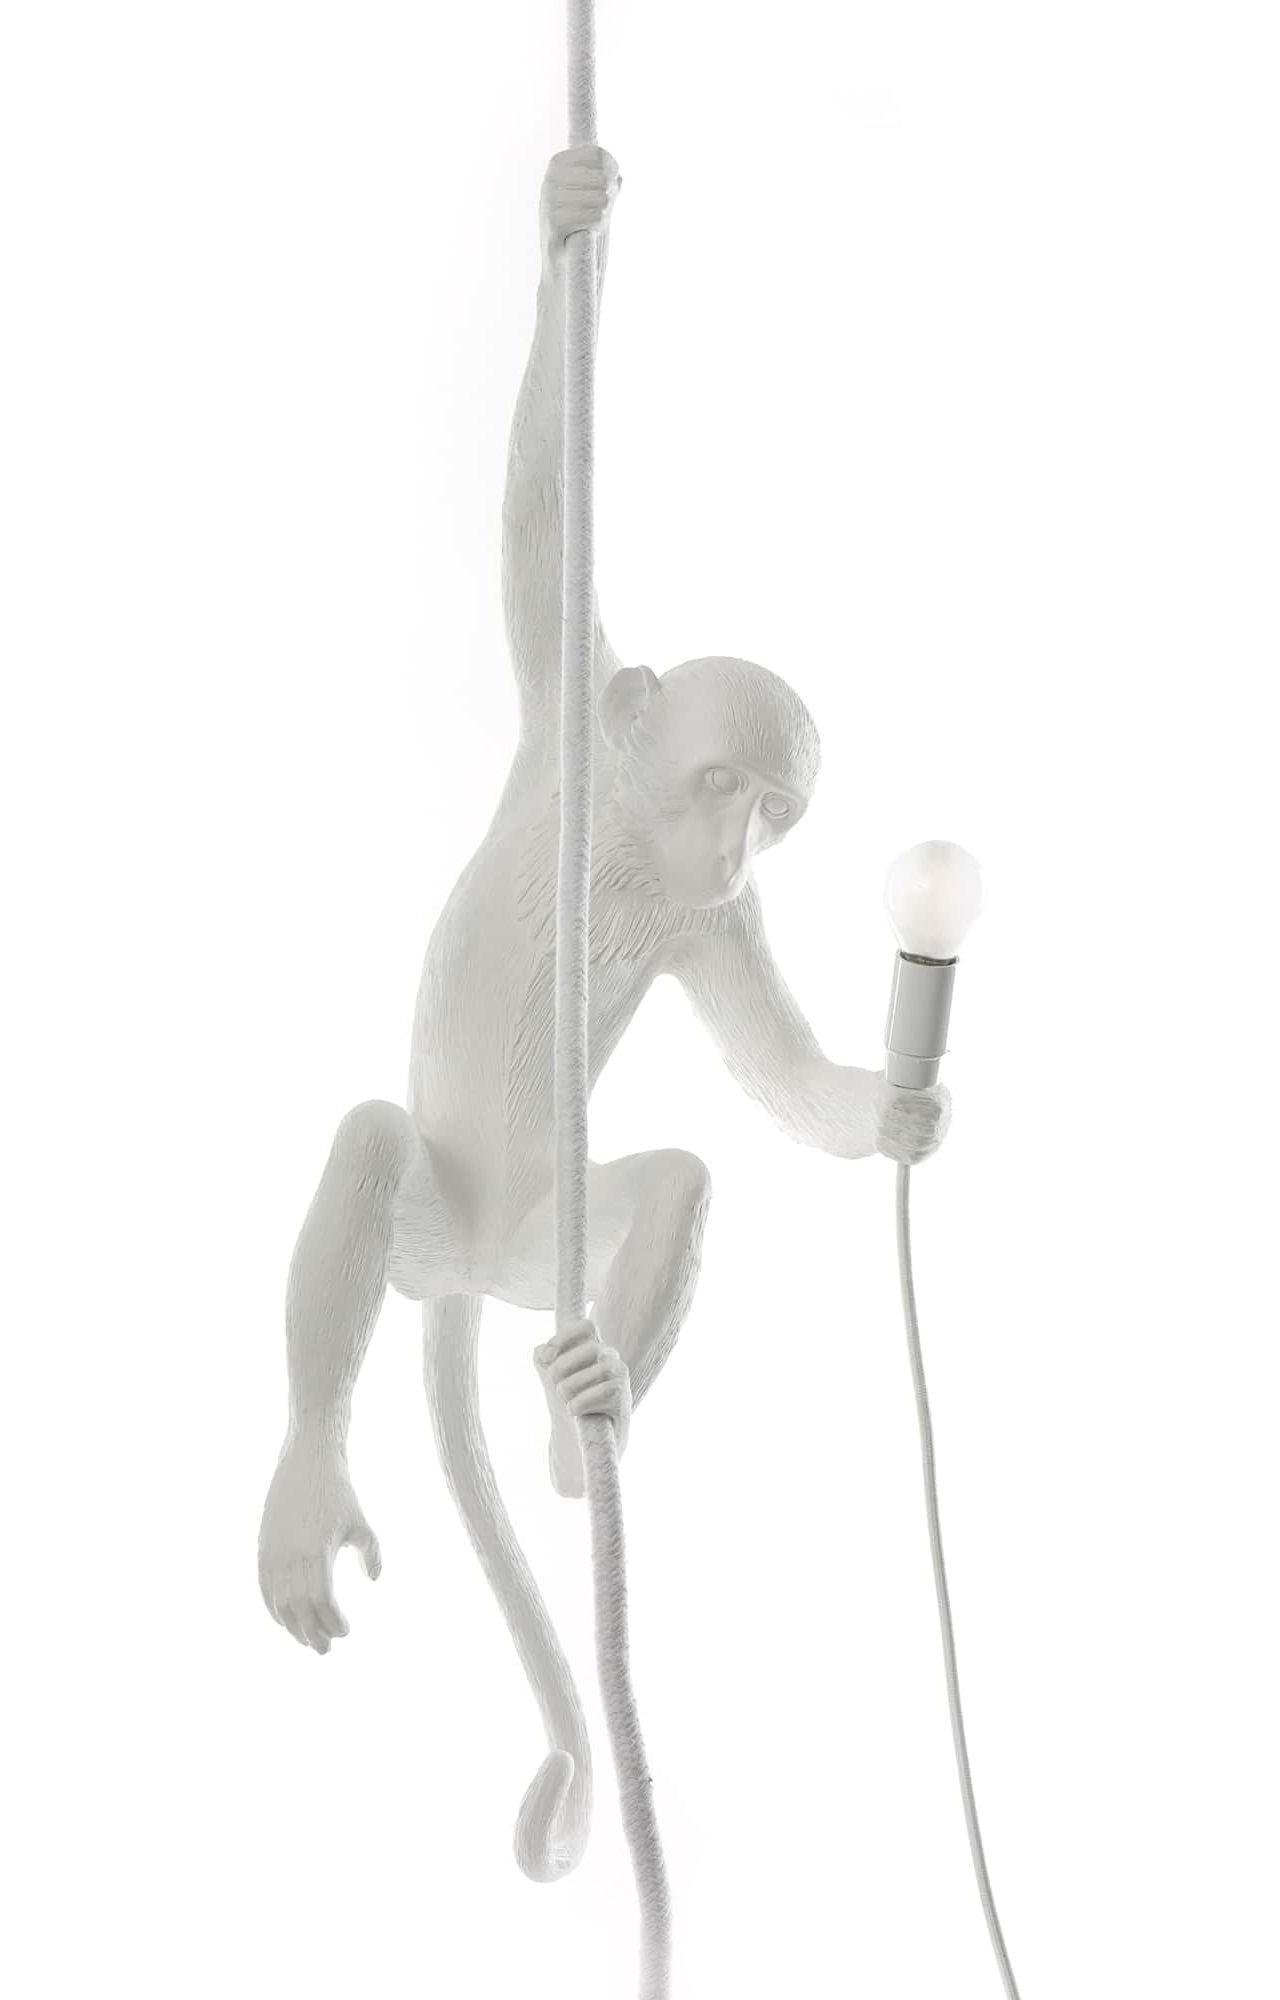 Luminaire - Suspensions - Suspension Monkey Hanging / Outdoor - H 80 cm - Seletti - Blanc - Résine